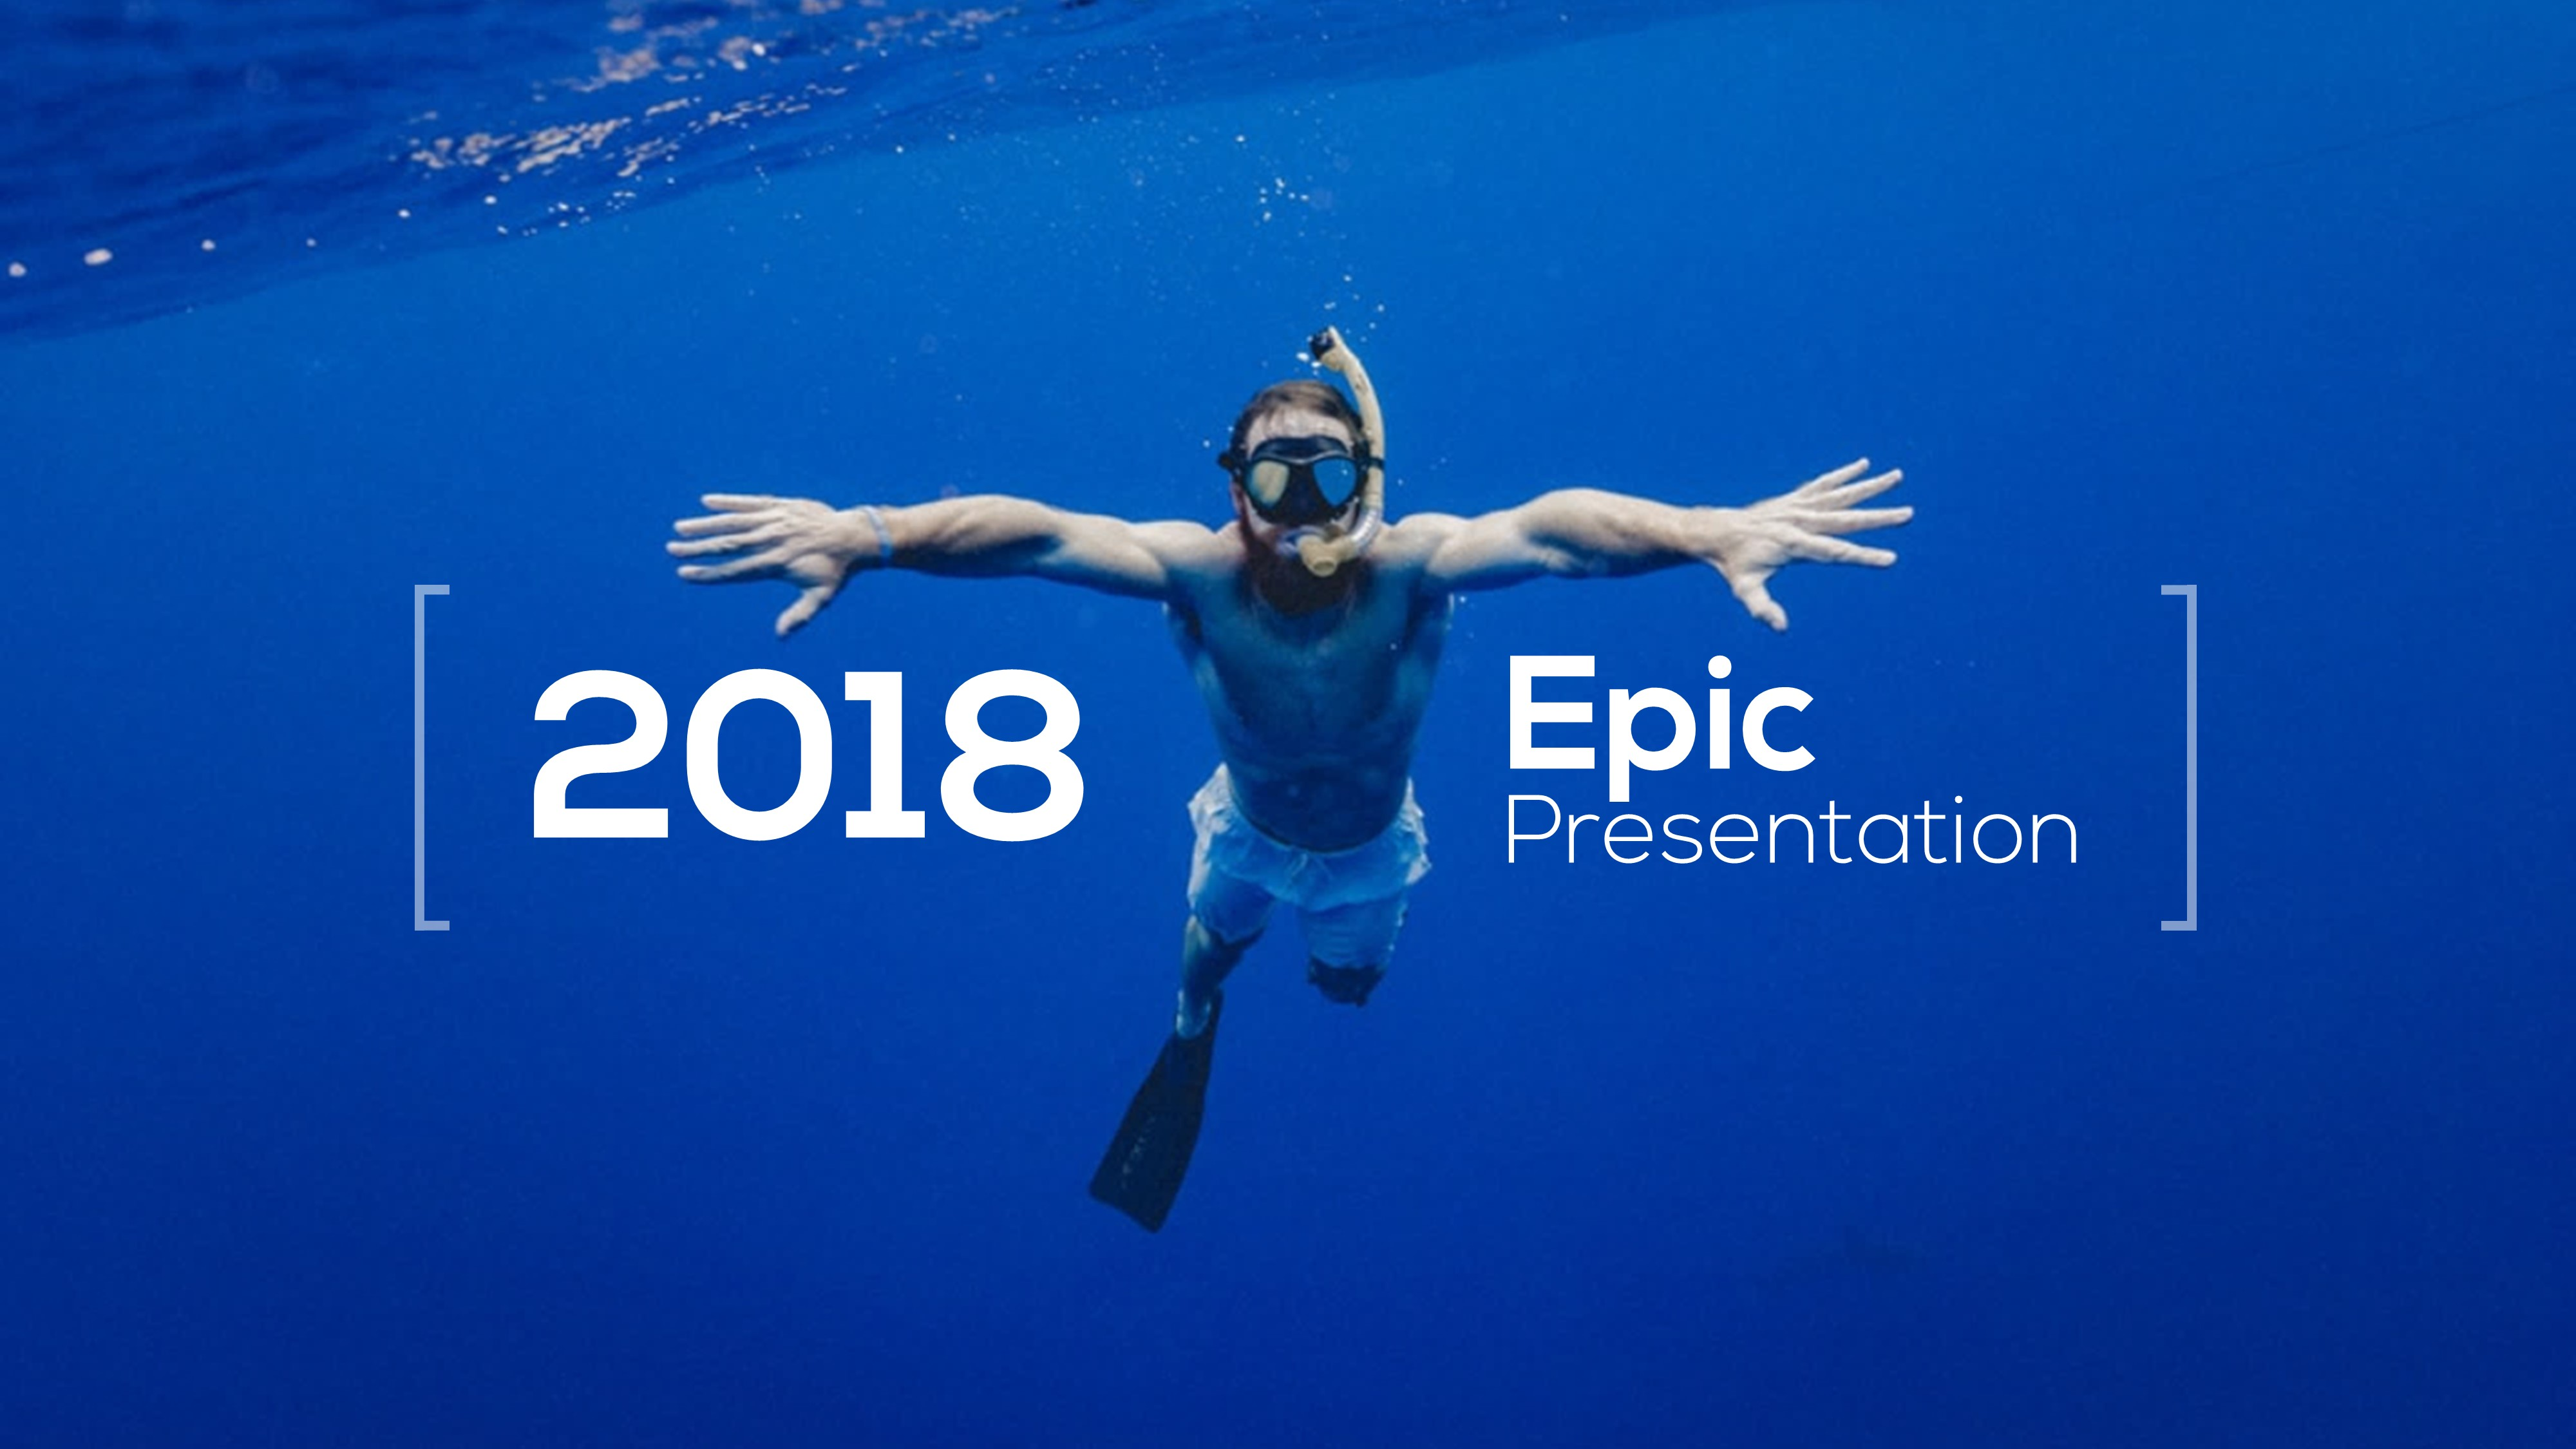 Epic powerpoint presentation powerpoint template #64442.